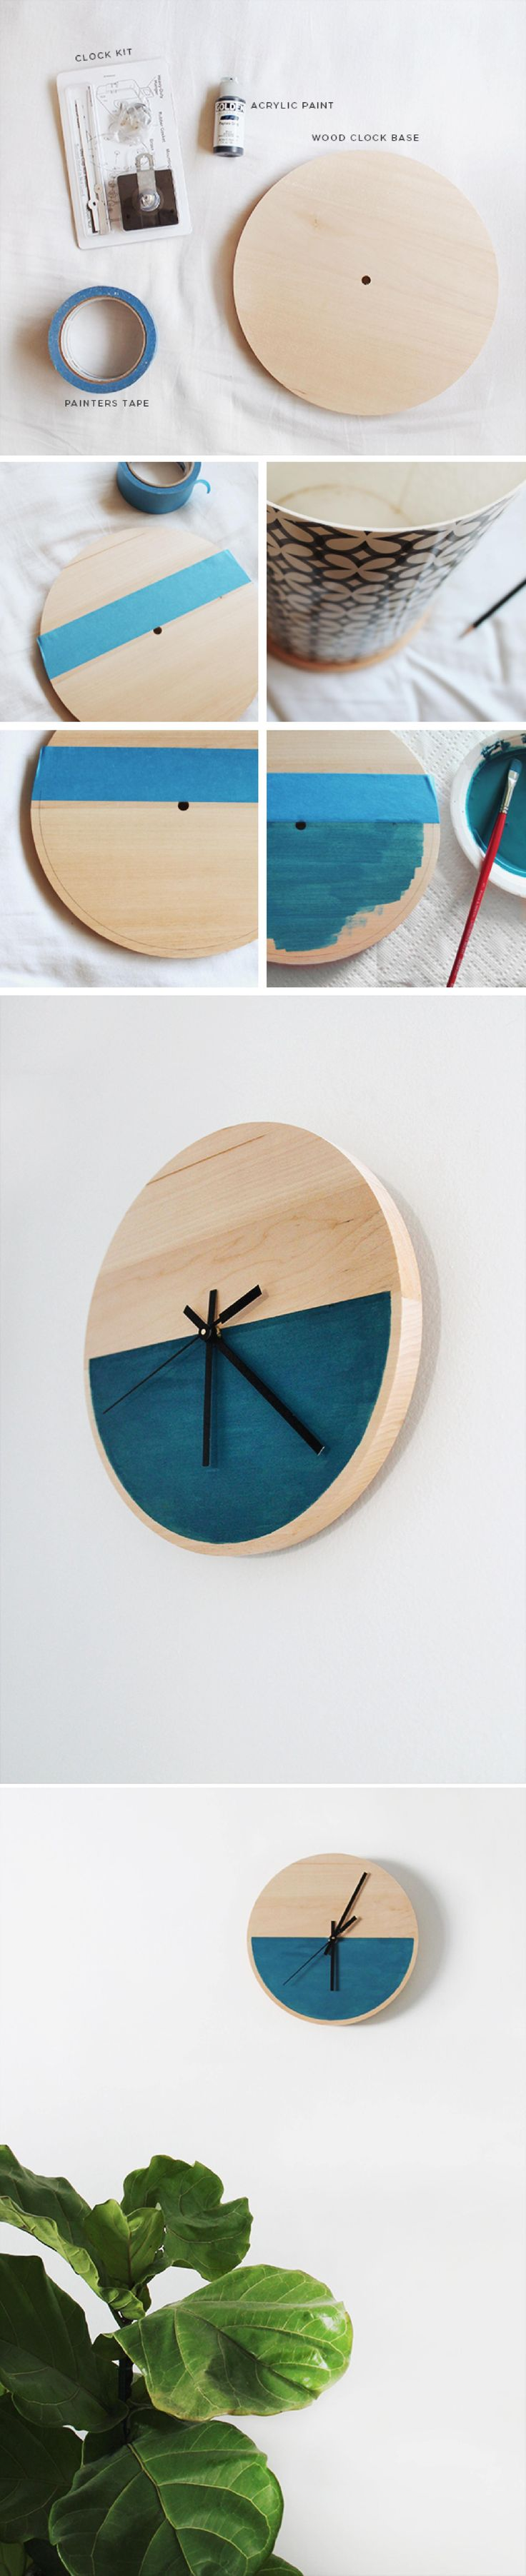 reloj pared DIY muy ingenioso 2